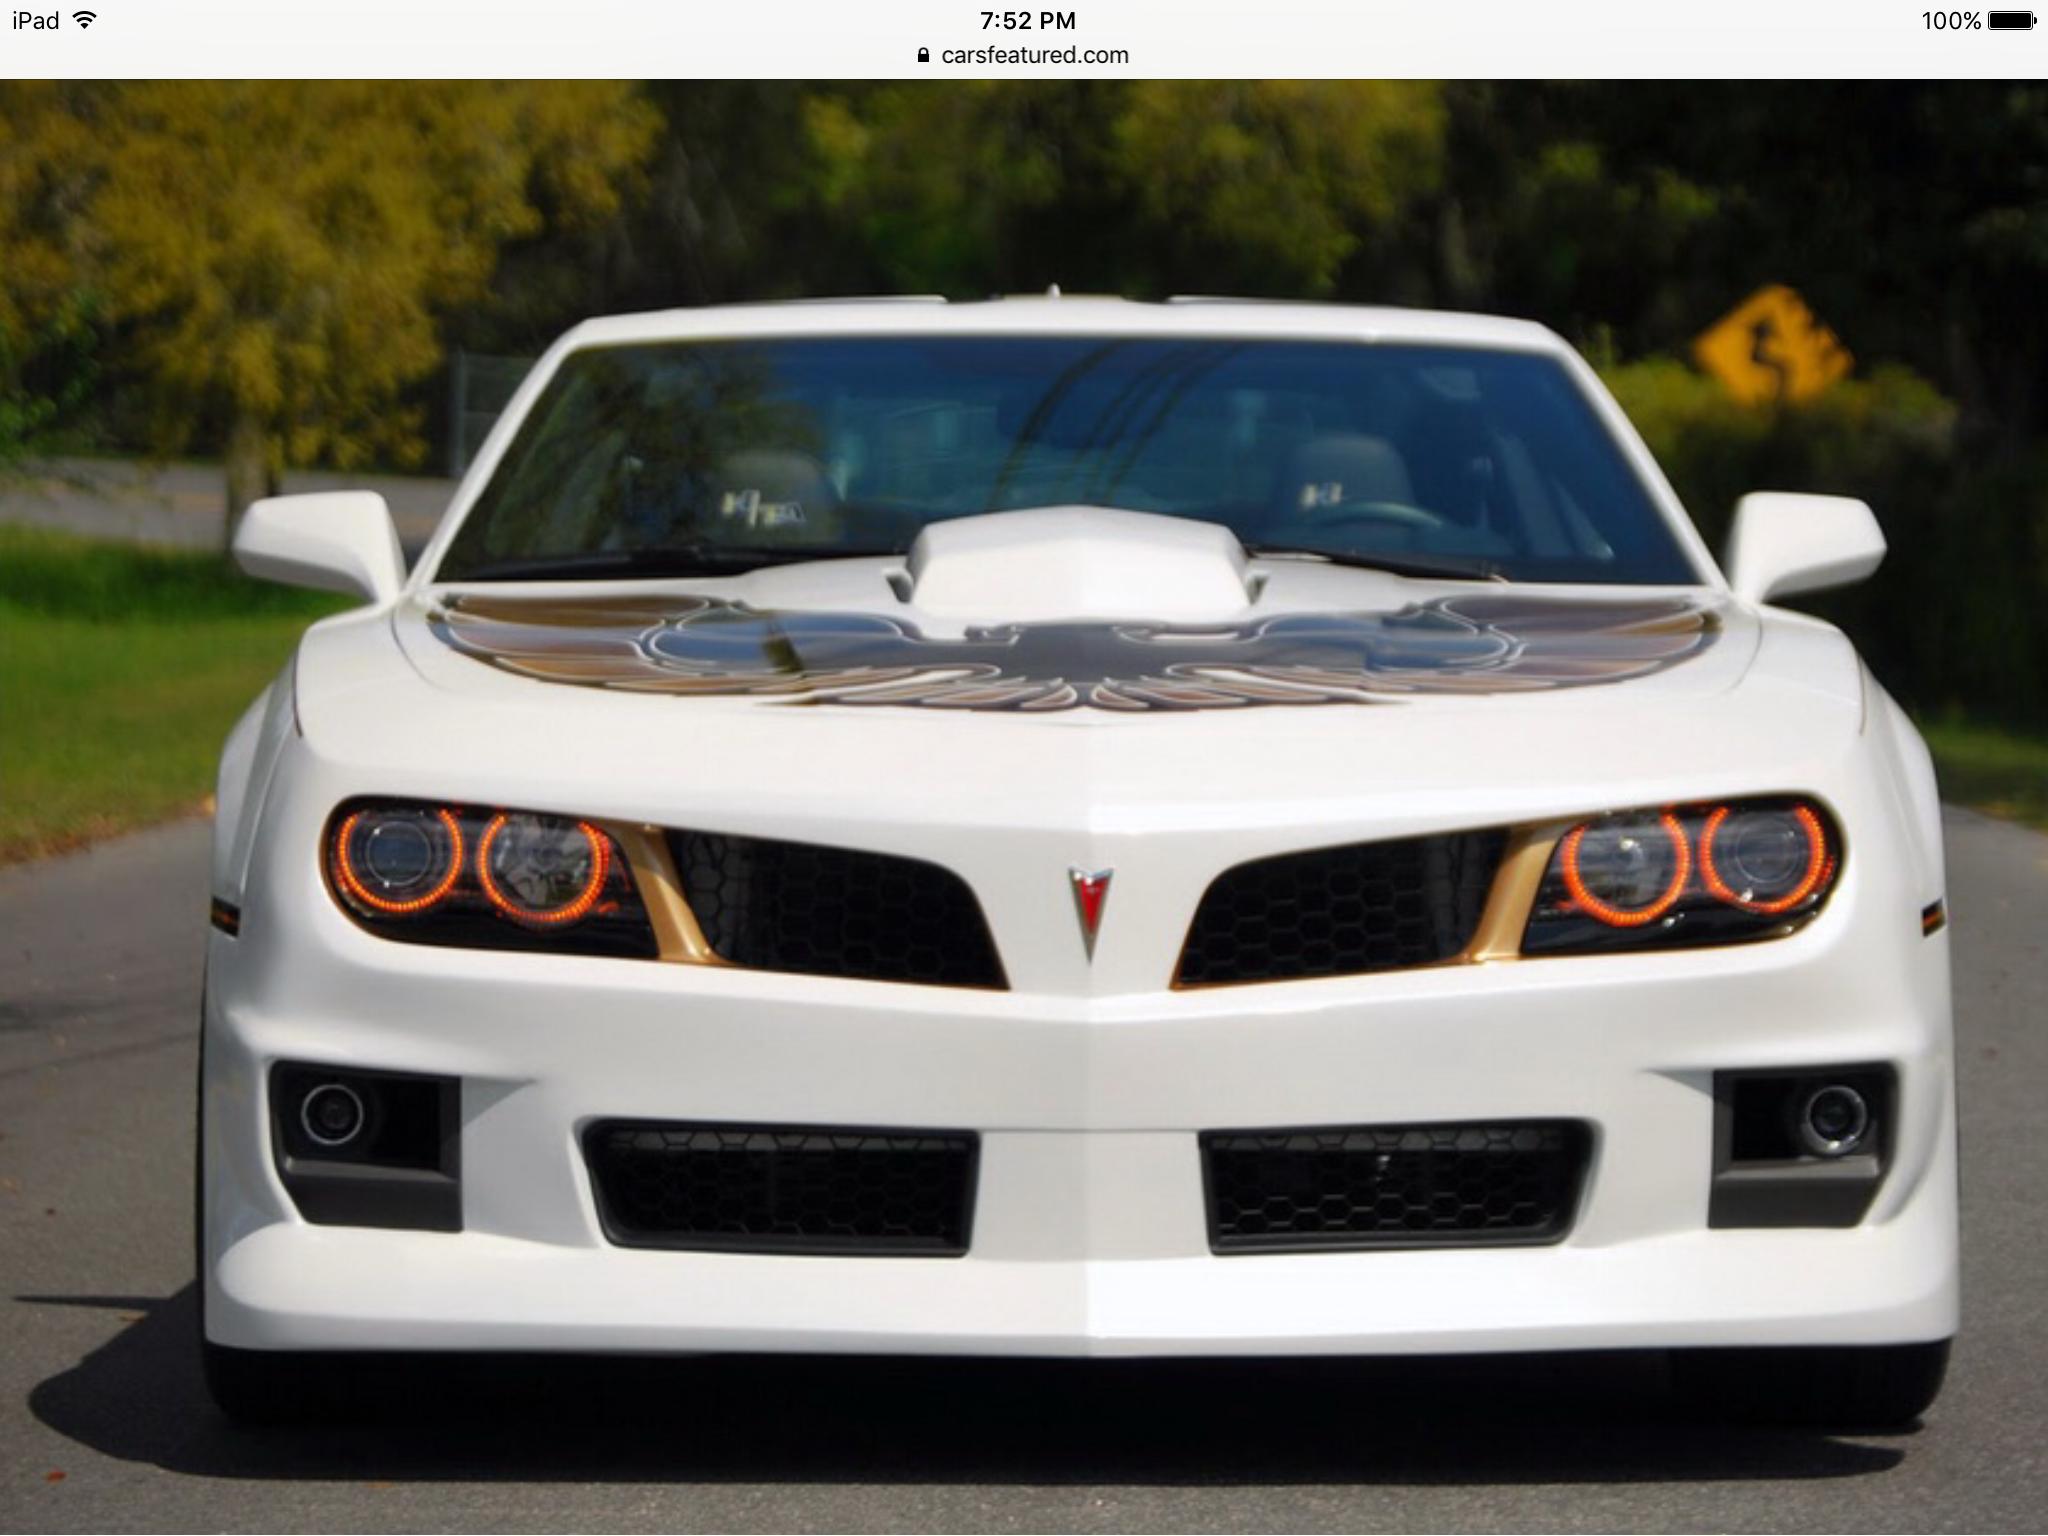 2015 Pontiac Trans Am Firebird Price and Release Date